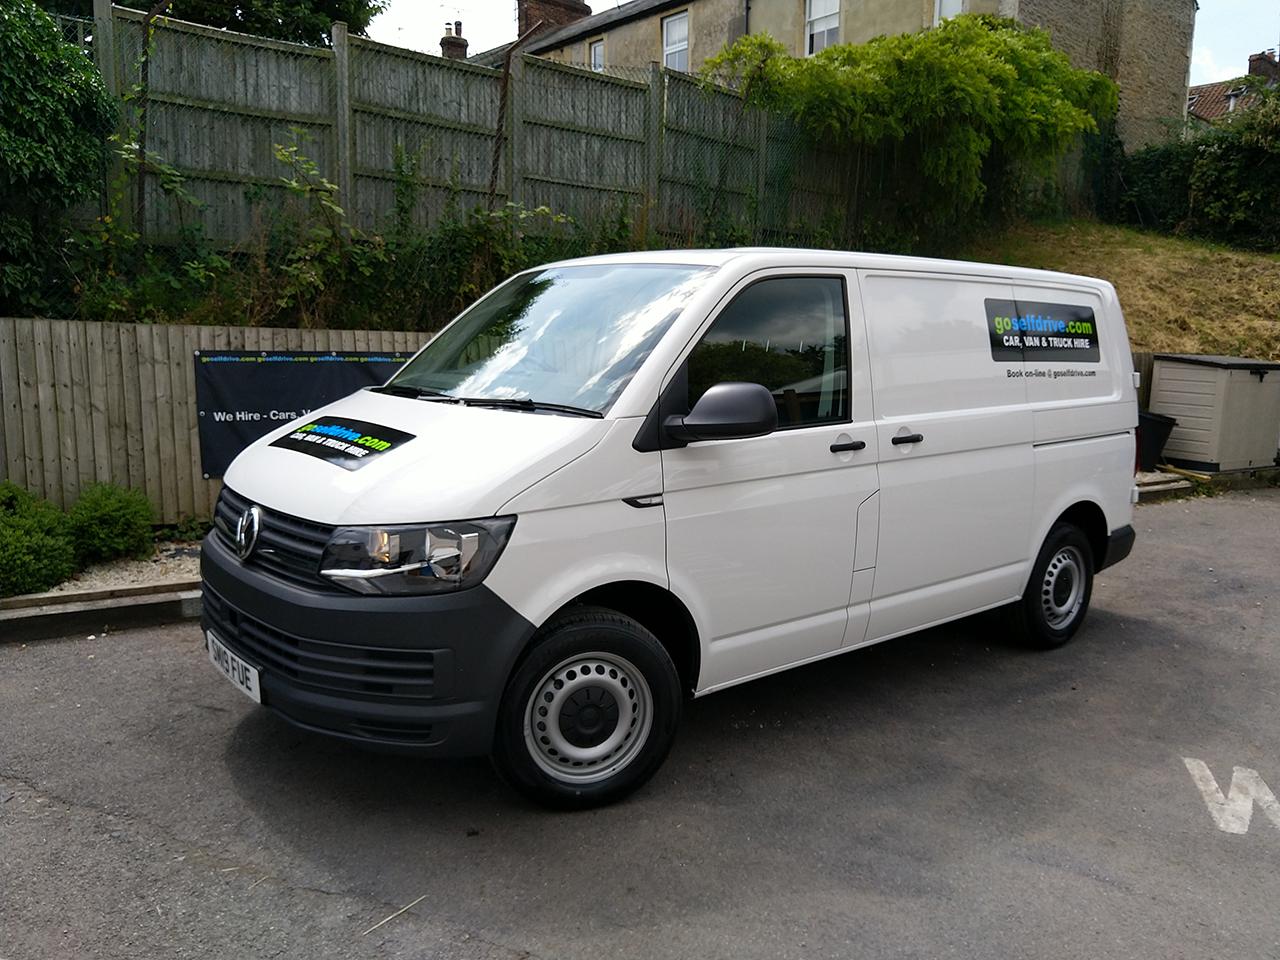 ee1911c51e Medium Sized Van Hire